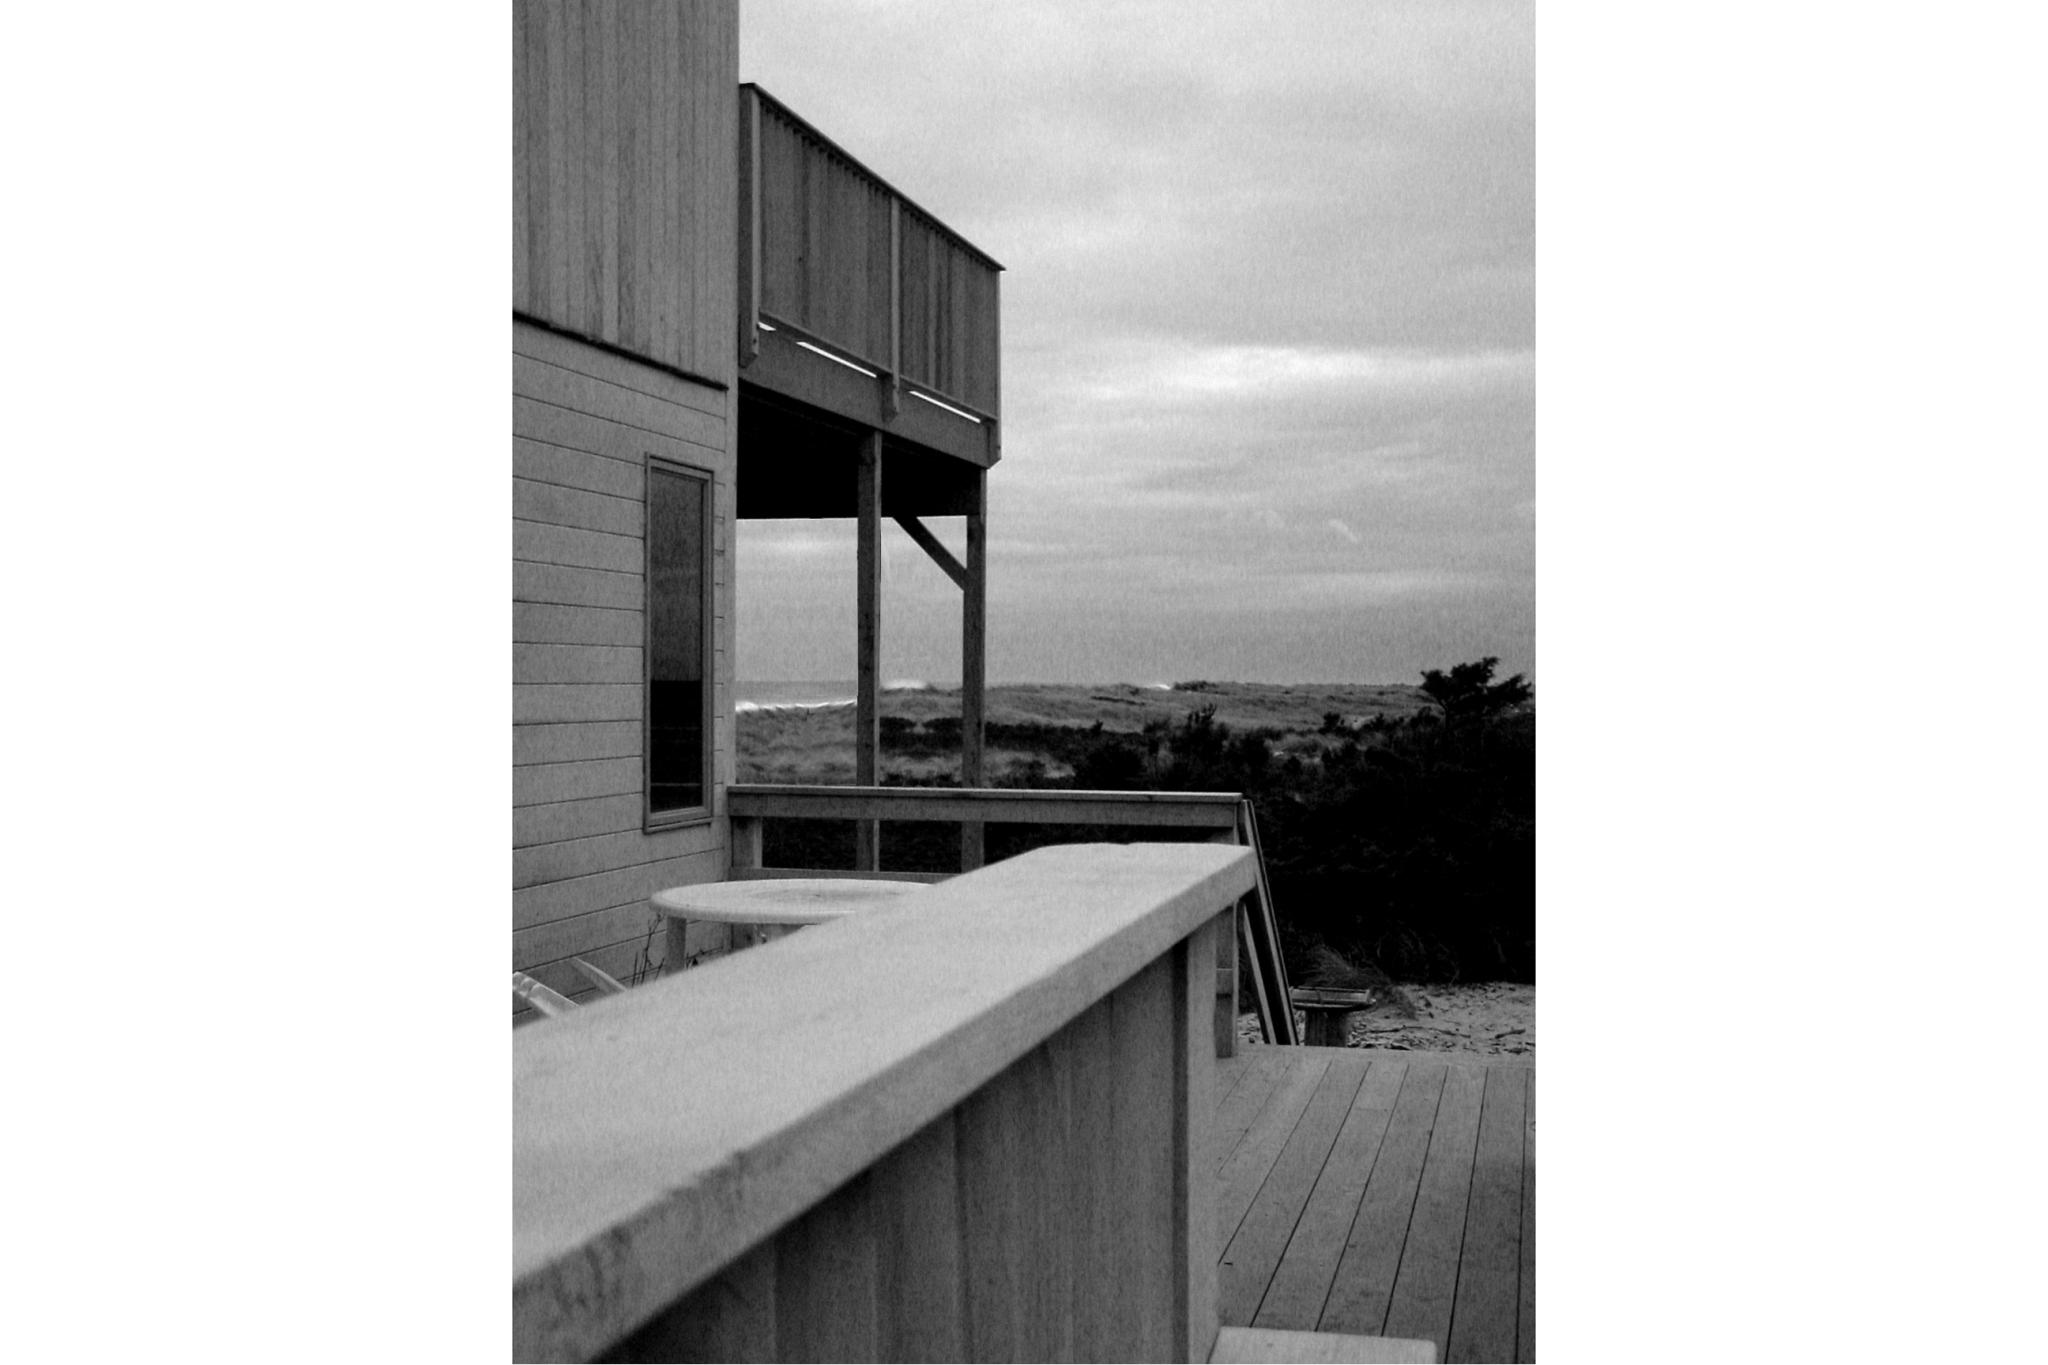 03 - Side View (B&W).jpg